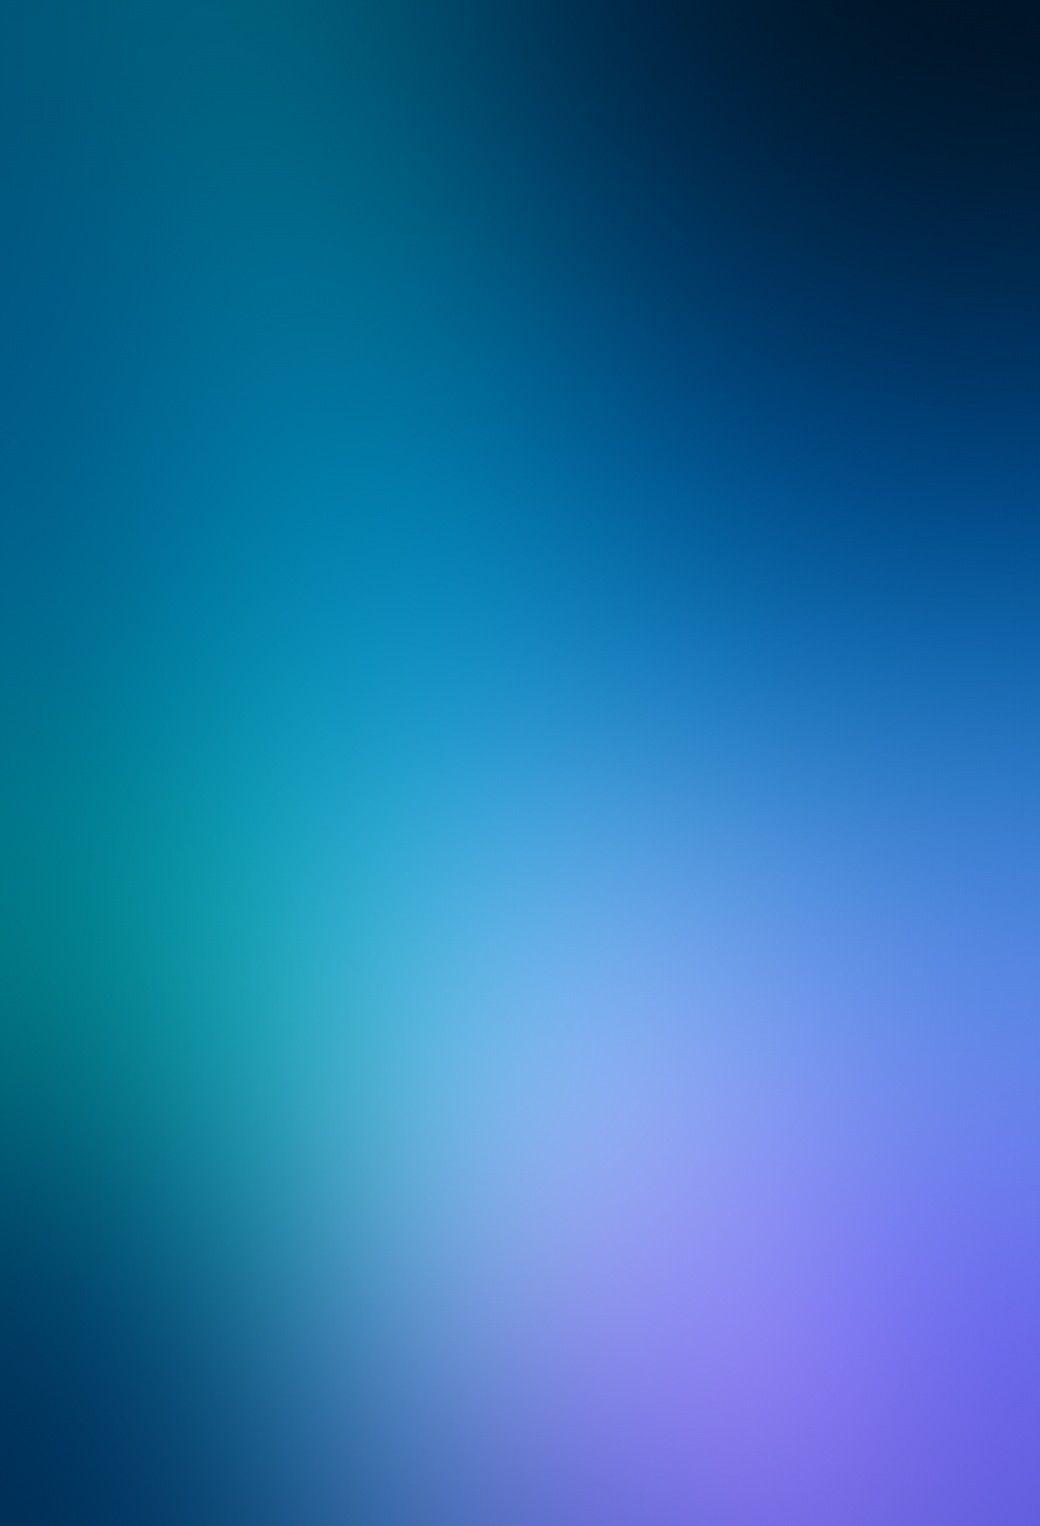 Soft Blue Gradient Blur Ios 11 Iphone X Wallpaper Hd Iphone